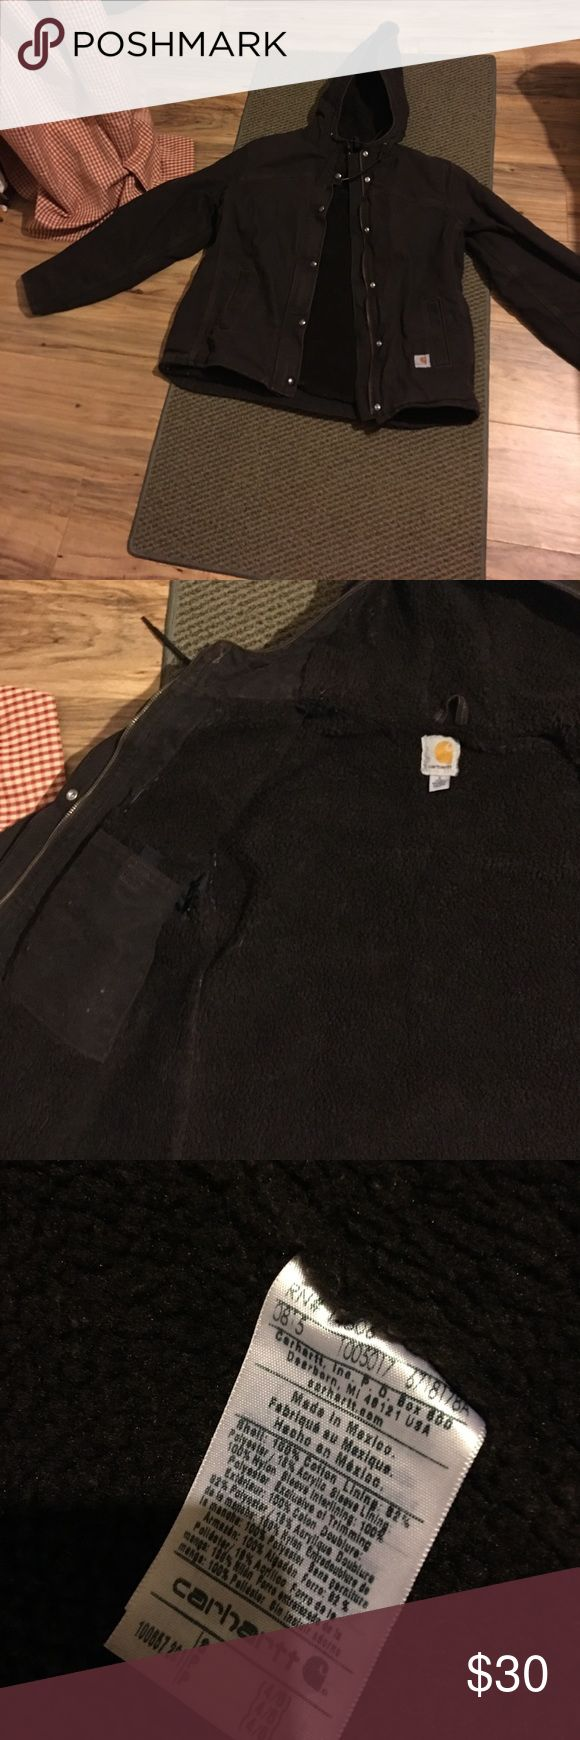 Womens brown carhartt jacket Brown carhartt jacket sz s(4/6) new W/o tags Carhartt Jackets & Coats Utility Jackets